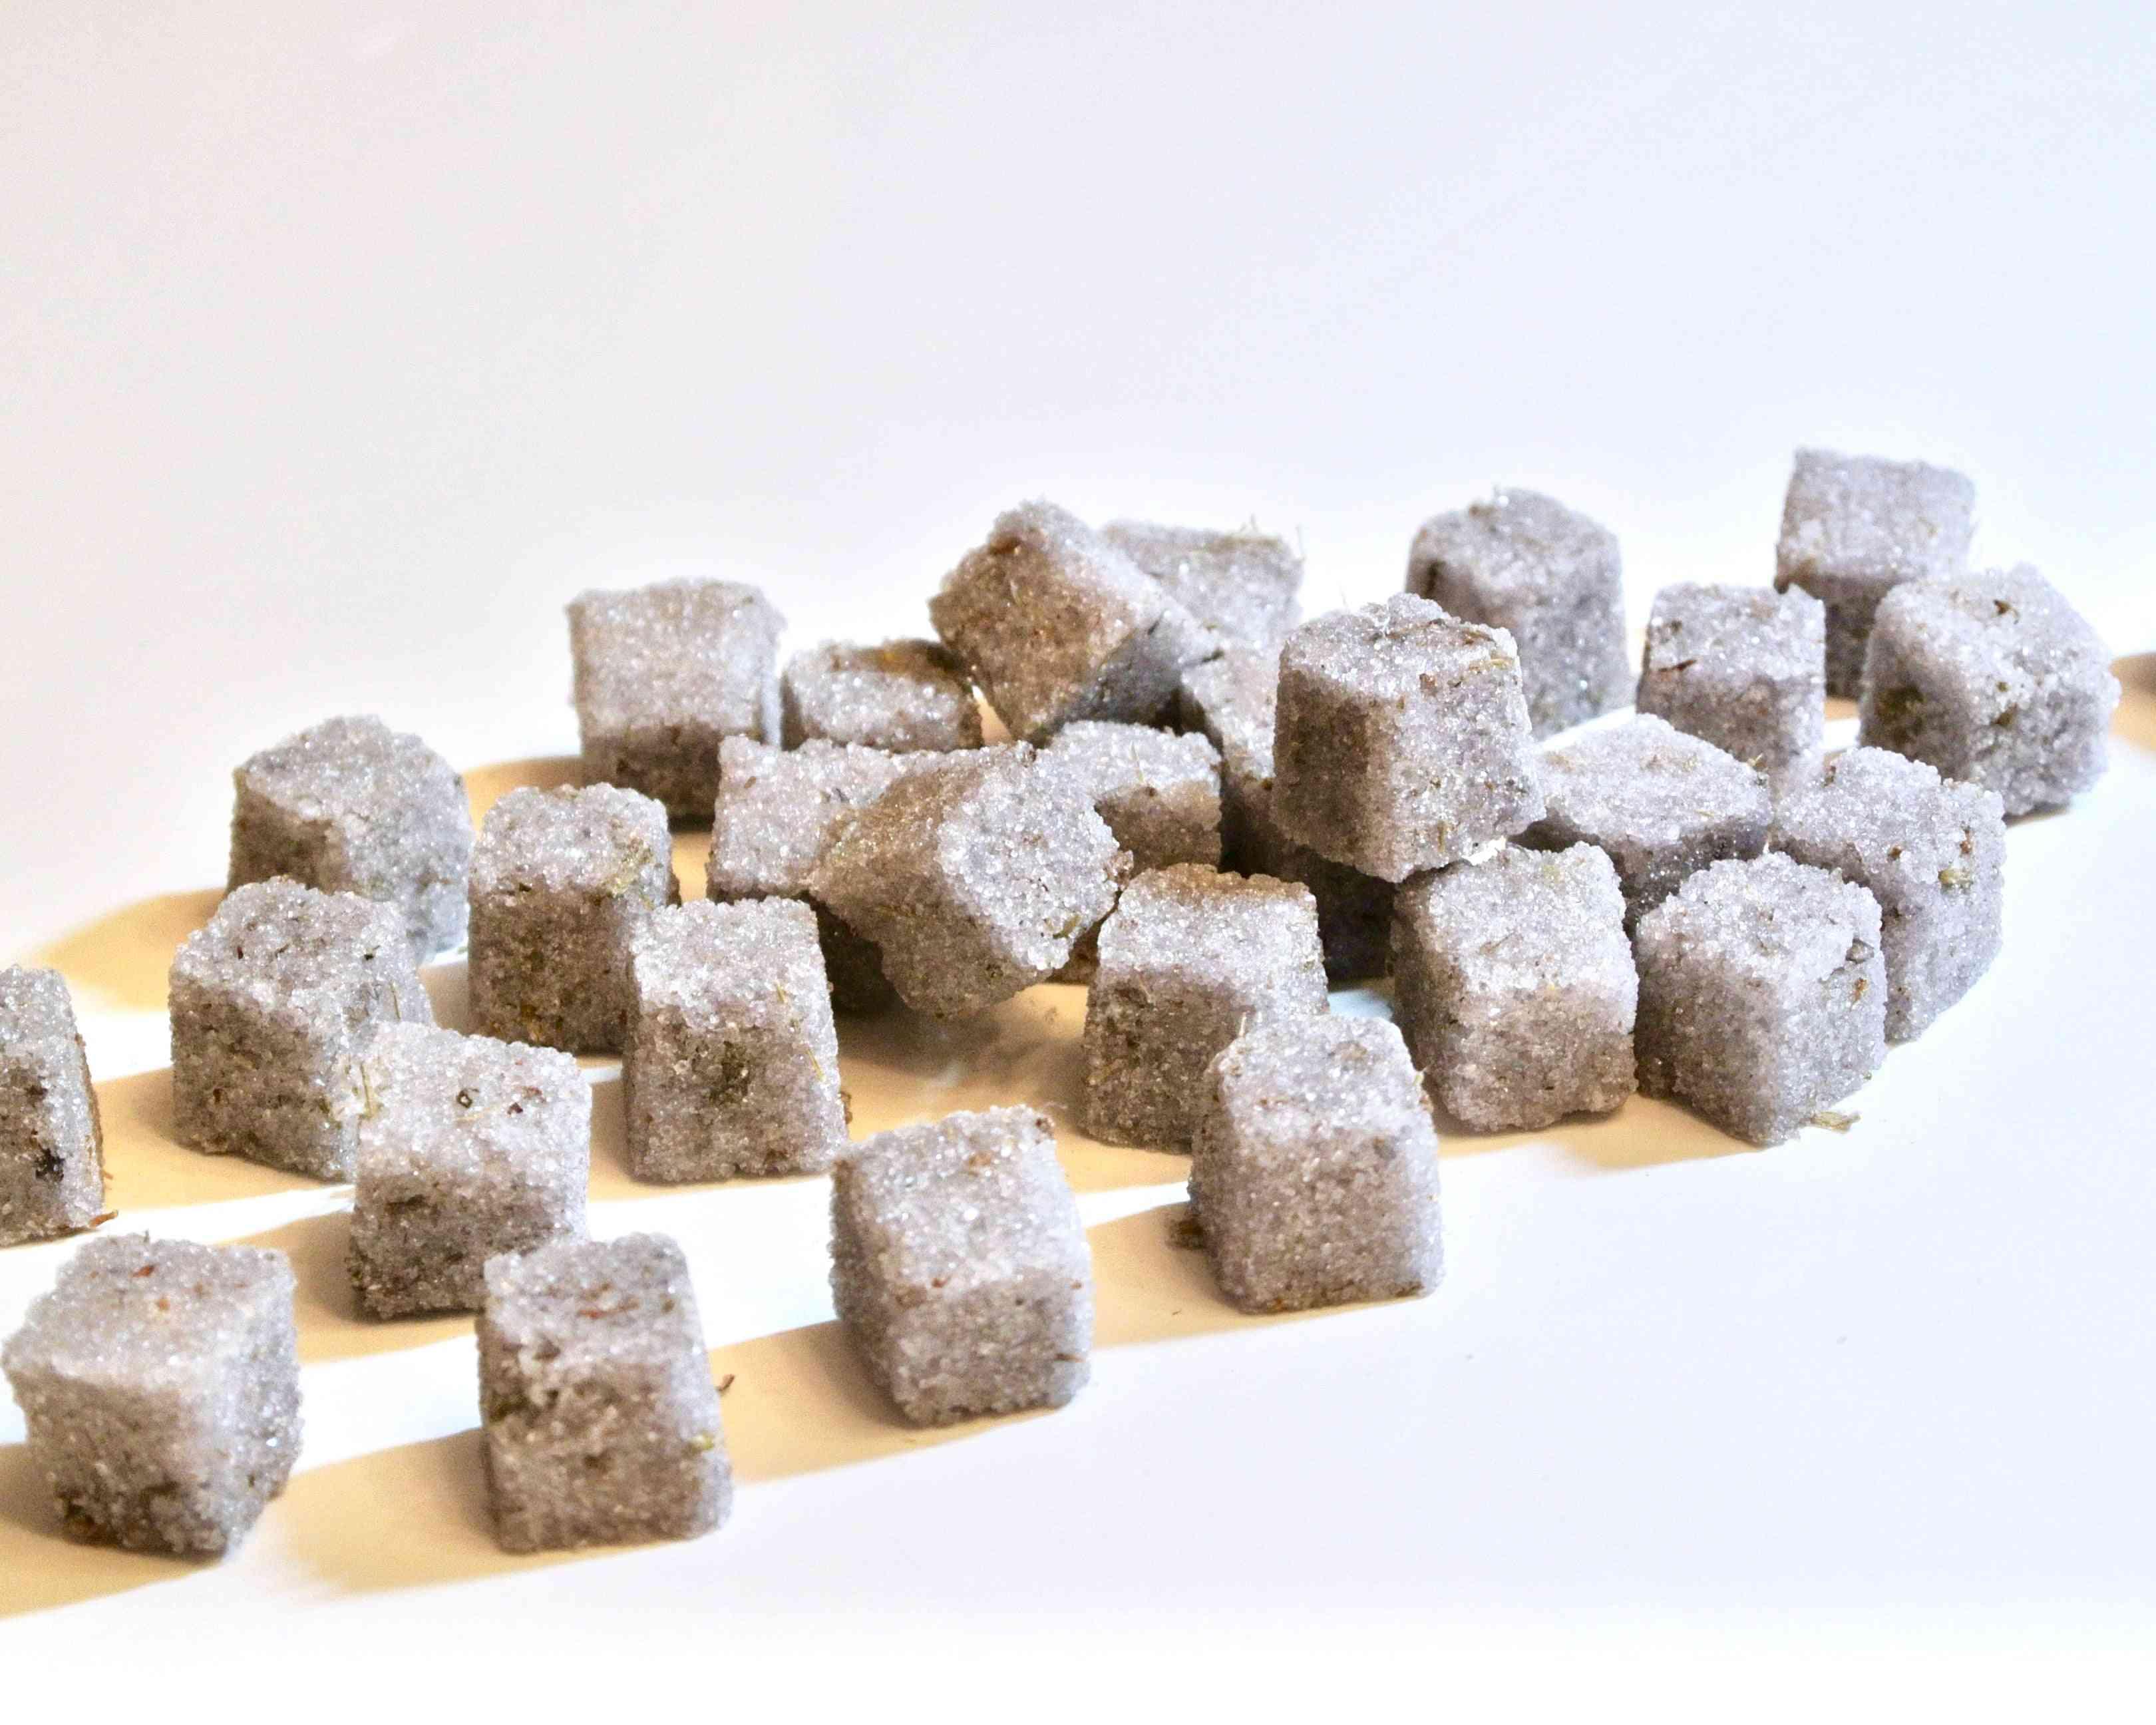 Lavender Sugar Cubes, Champagne Toasts, Tea